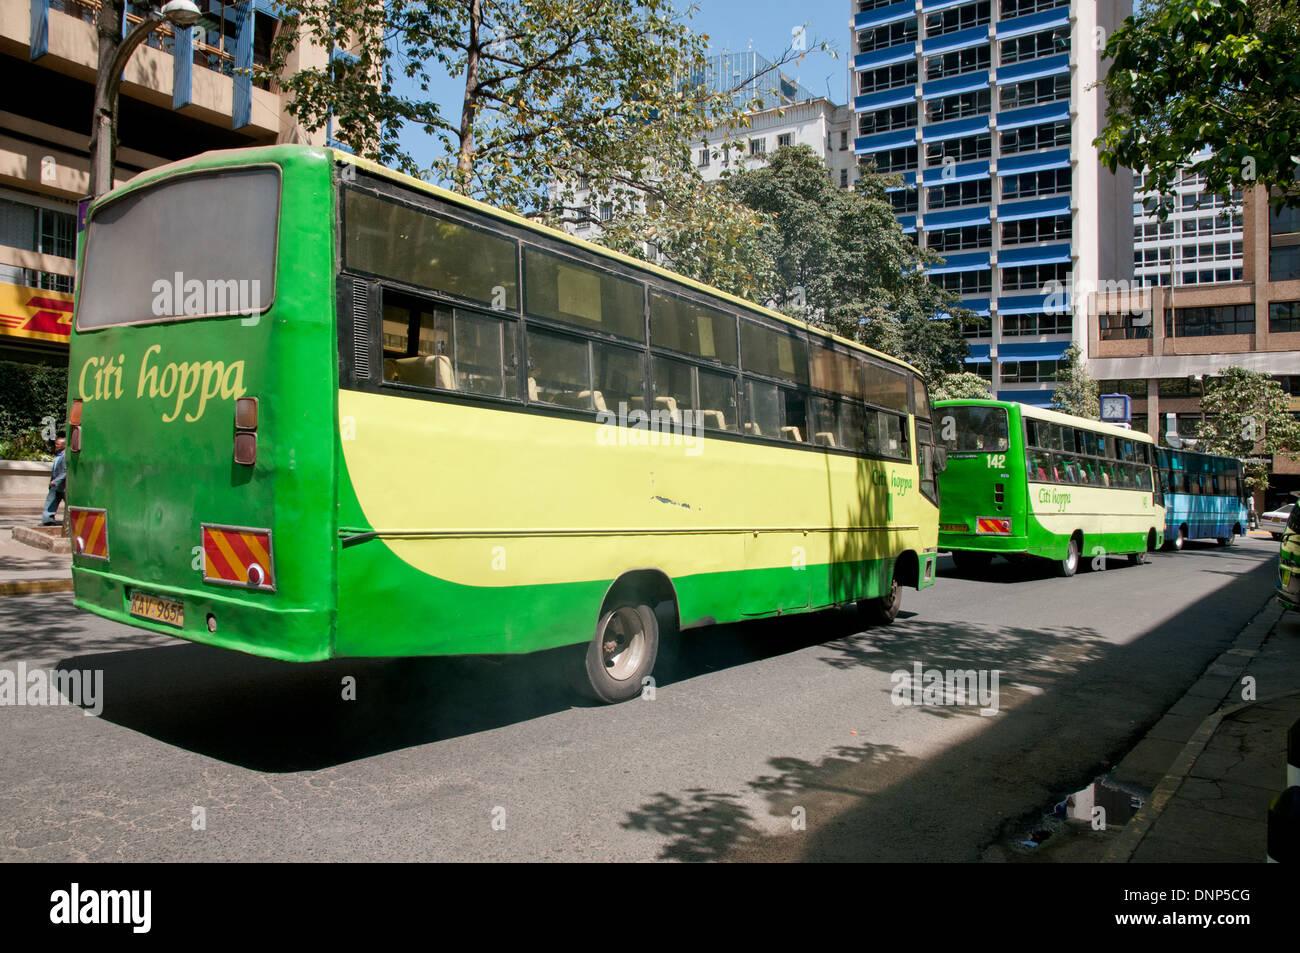 Dos buses verde y azul Citi Hoppa Bus Kenya KBS Service bus en Simba Street en el centro de Nairobi Kenya Imagen De Stock